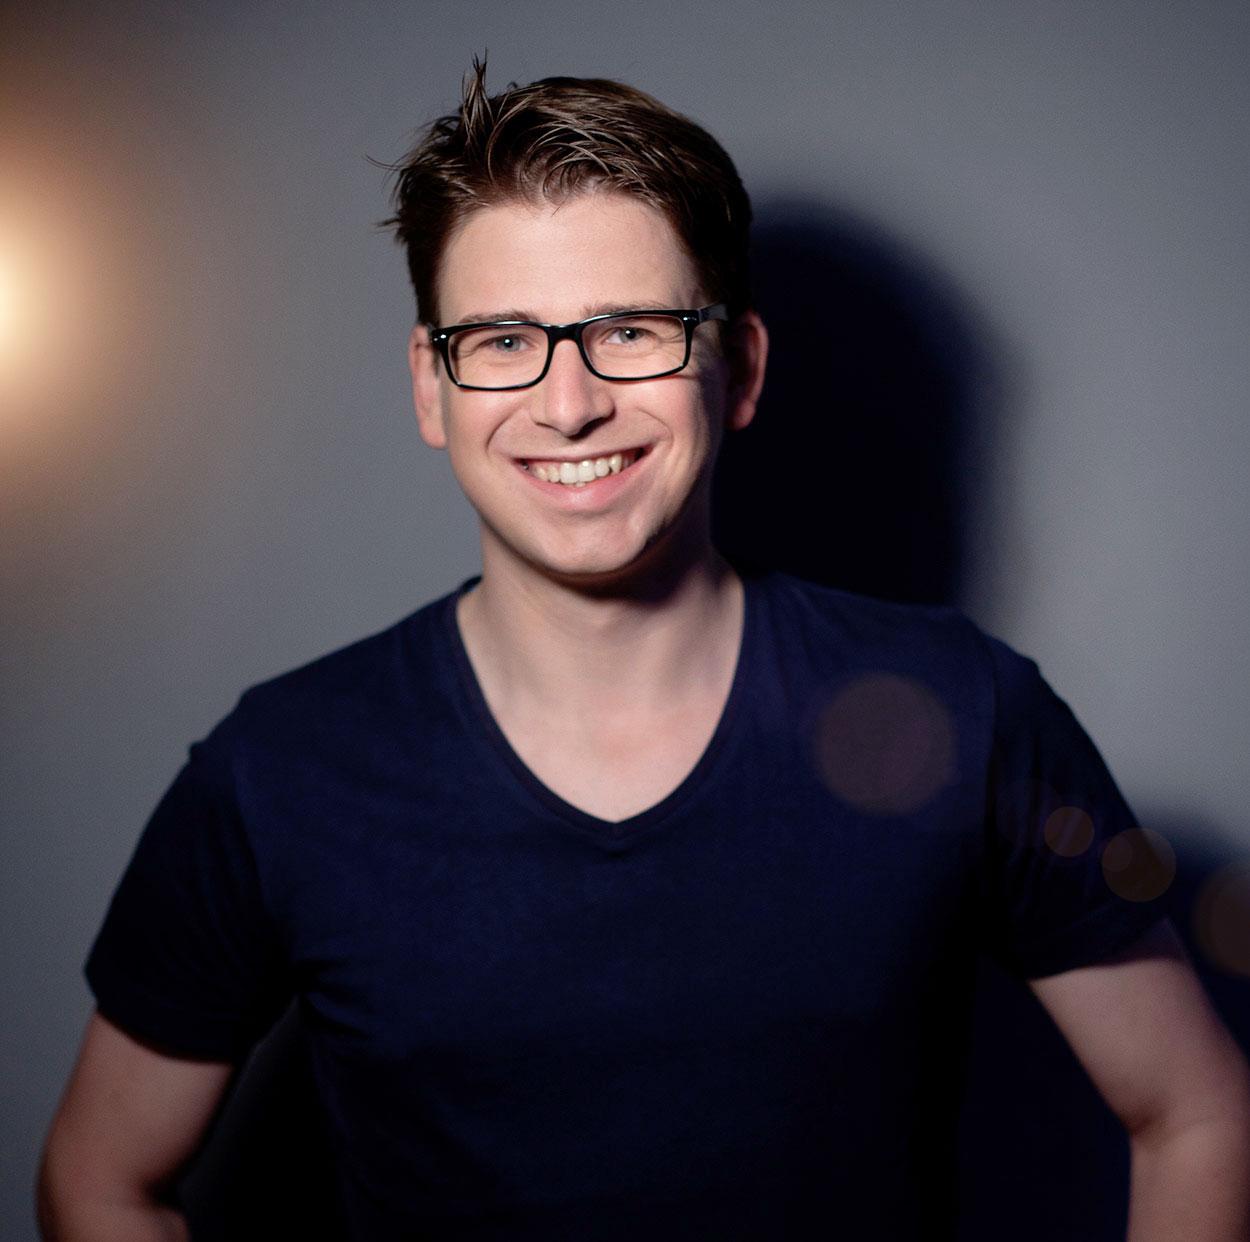 Thomas Vettermann Videoproduzent